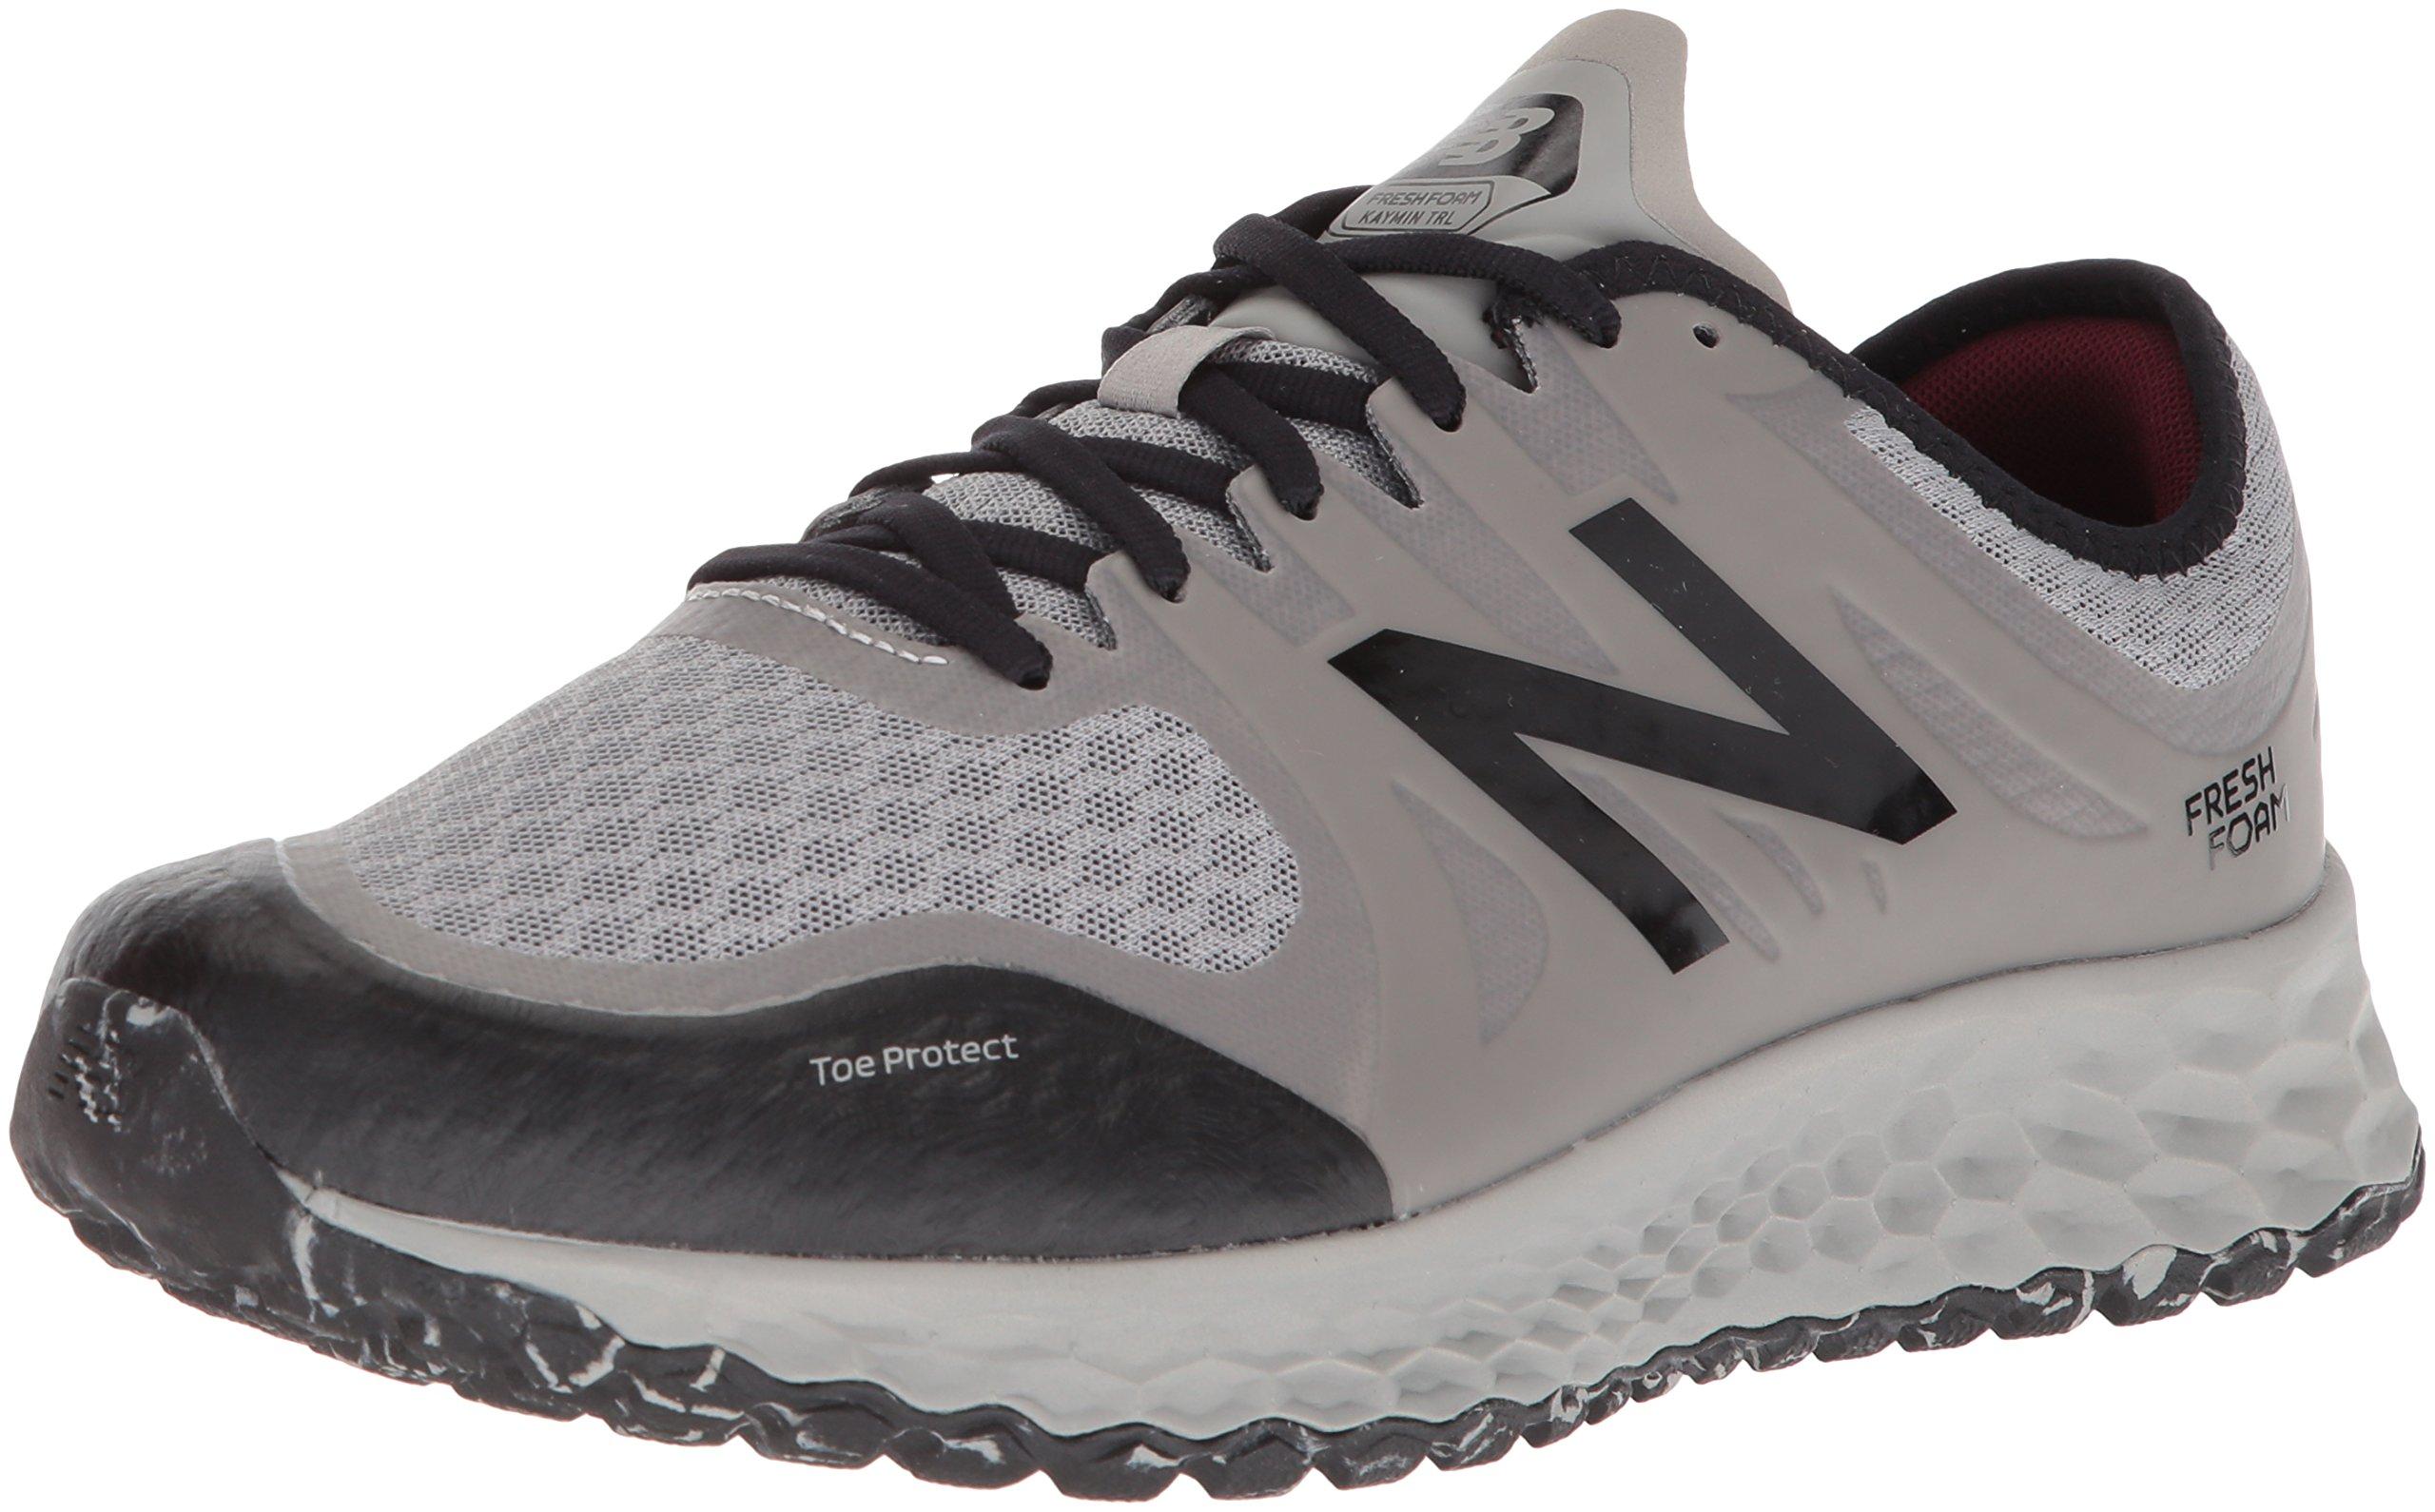 New Balance Men's Kaymin Trail v1 Fresh Foam Trail Running Shoe, Grey, 7 D US by New Balance (Image #1)